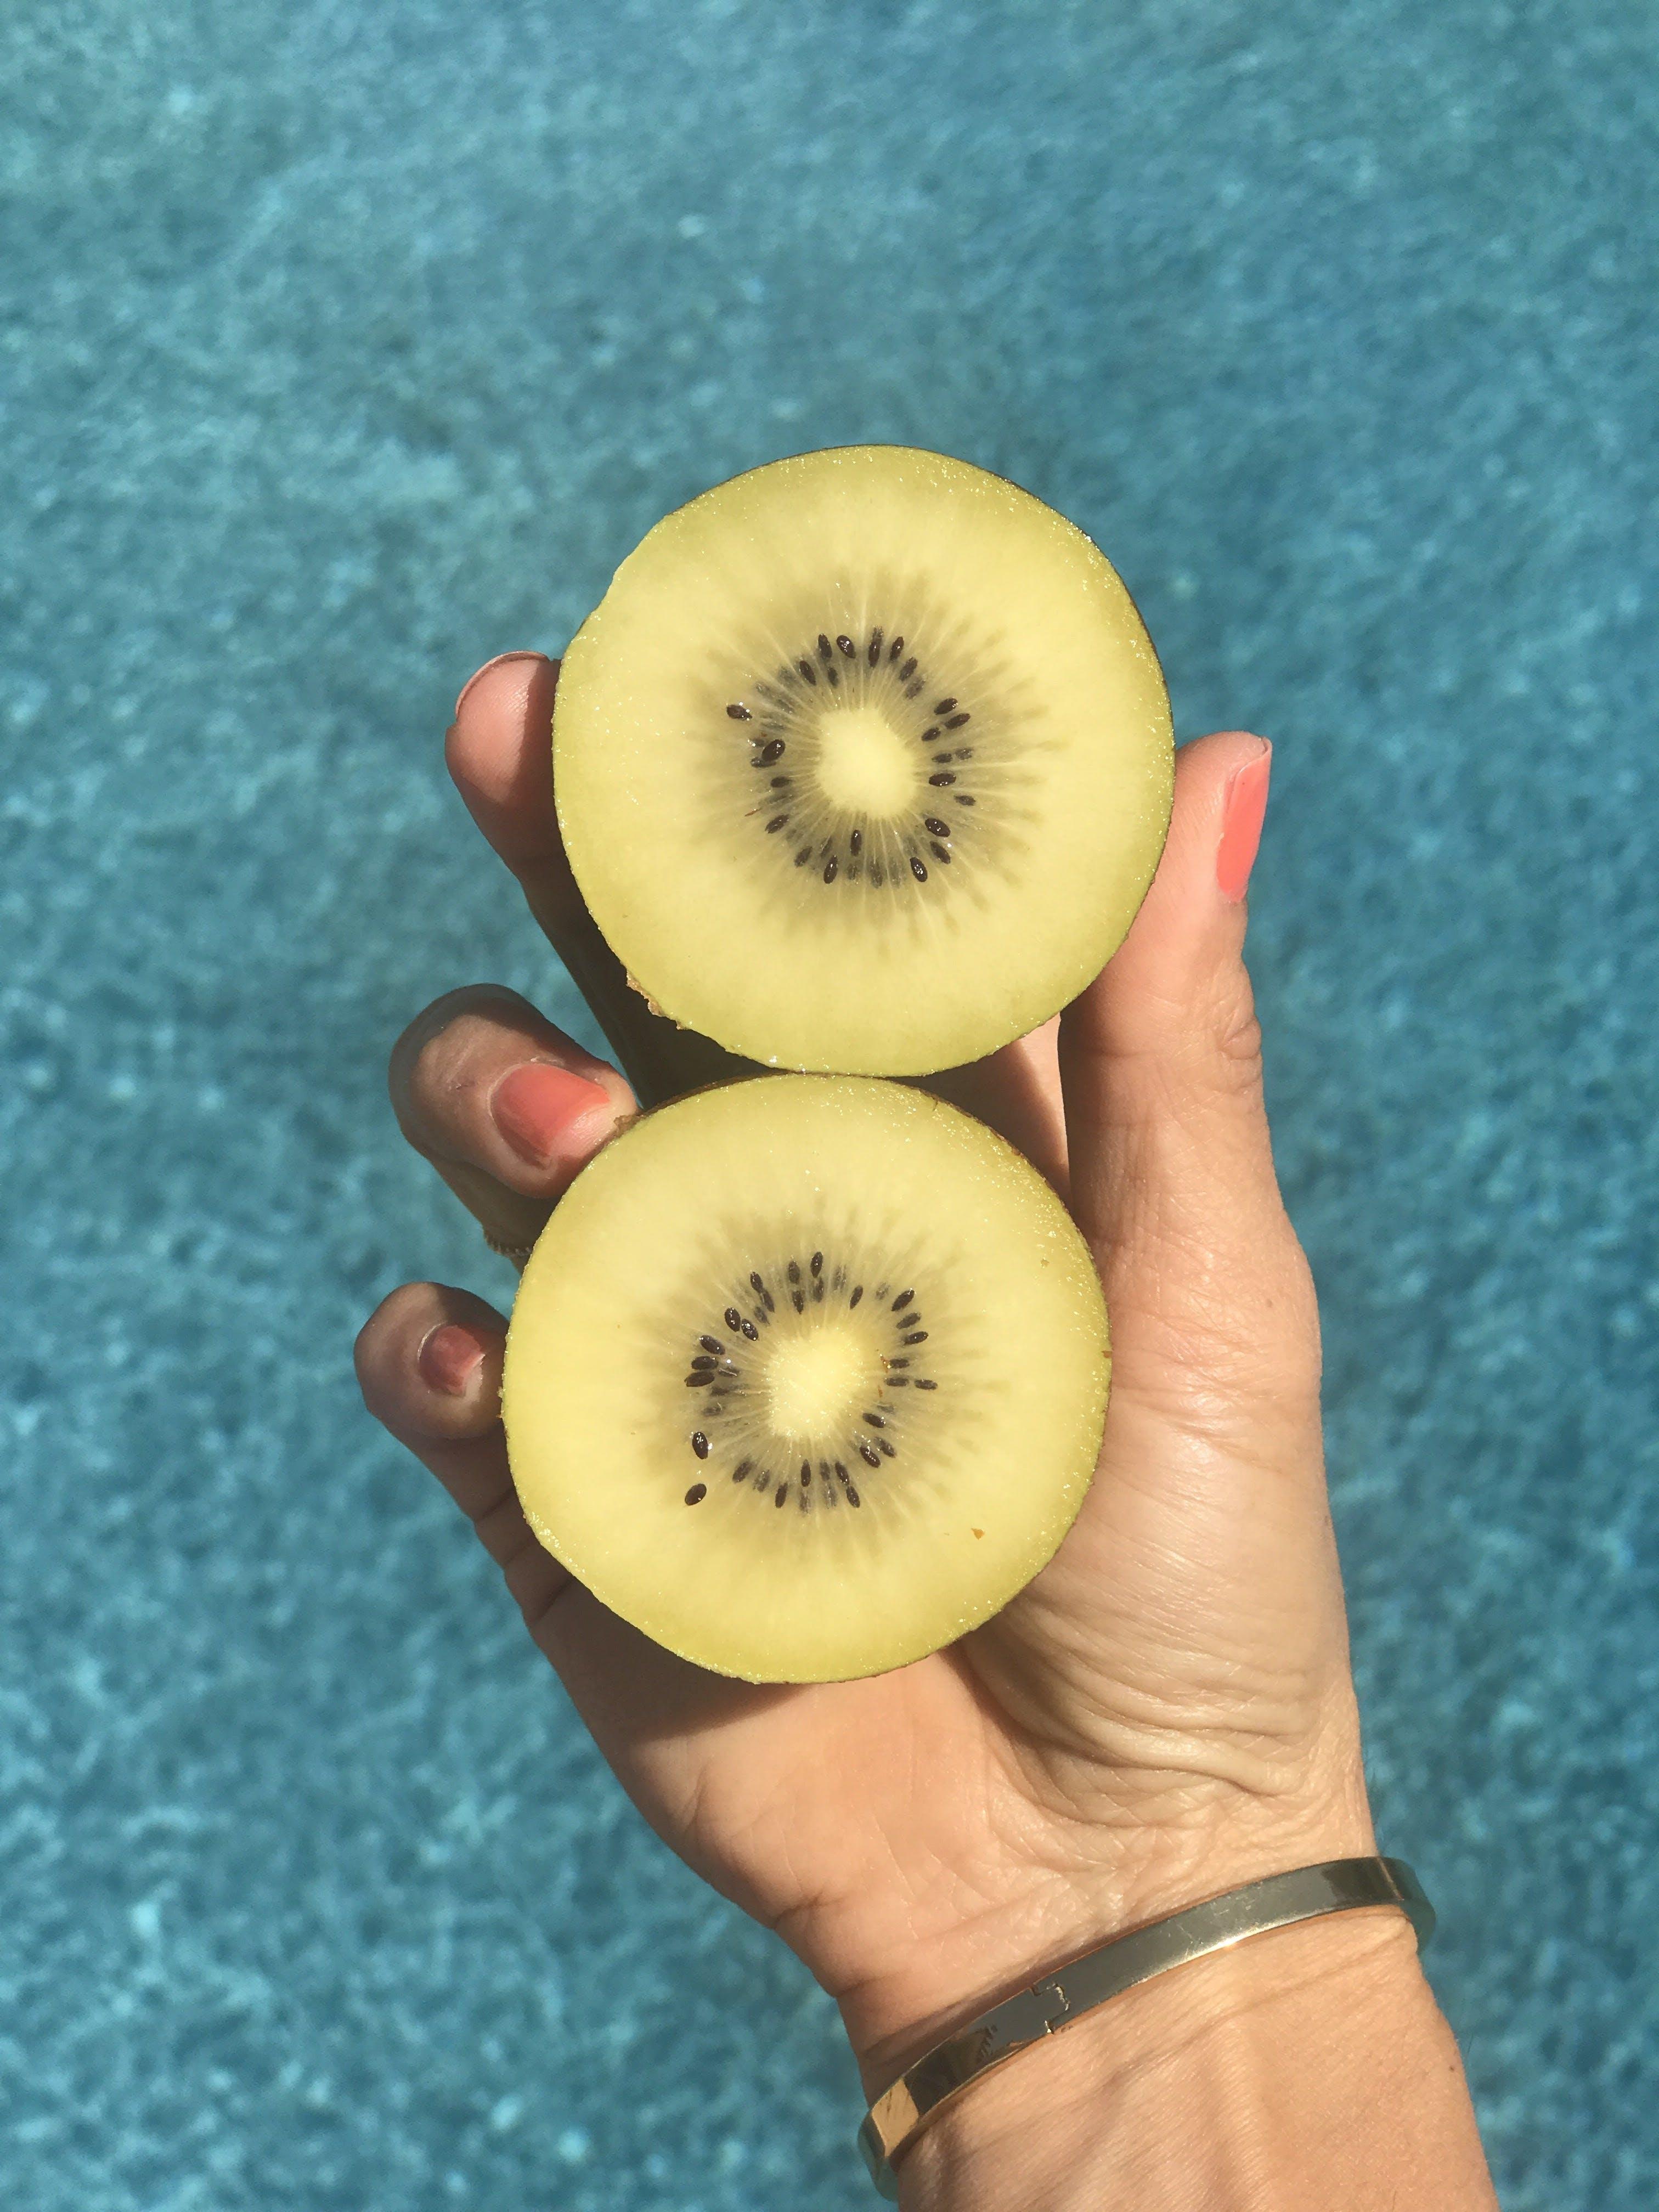 Free stock photo of kiwi fruit